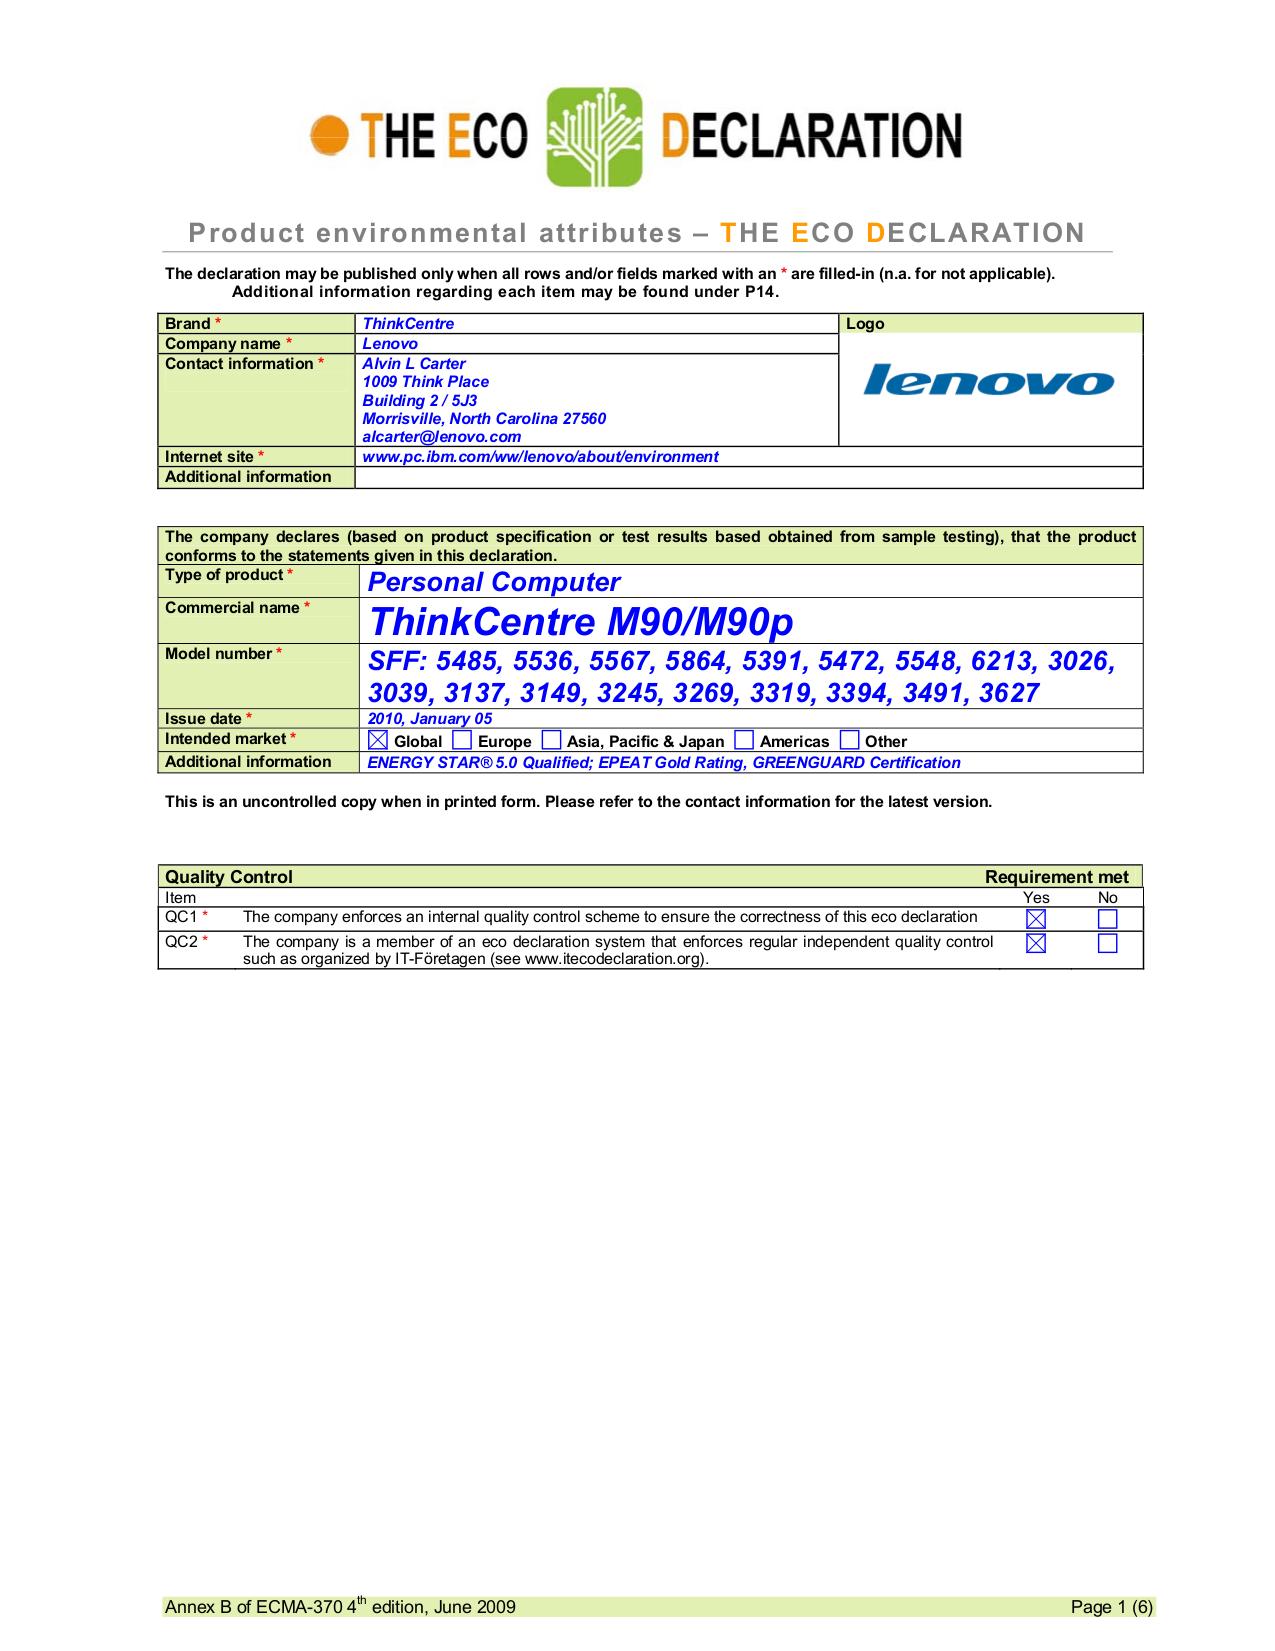 pdf for Lenovo Desktop ThinkCentre M90 5391 manual